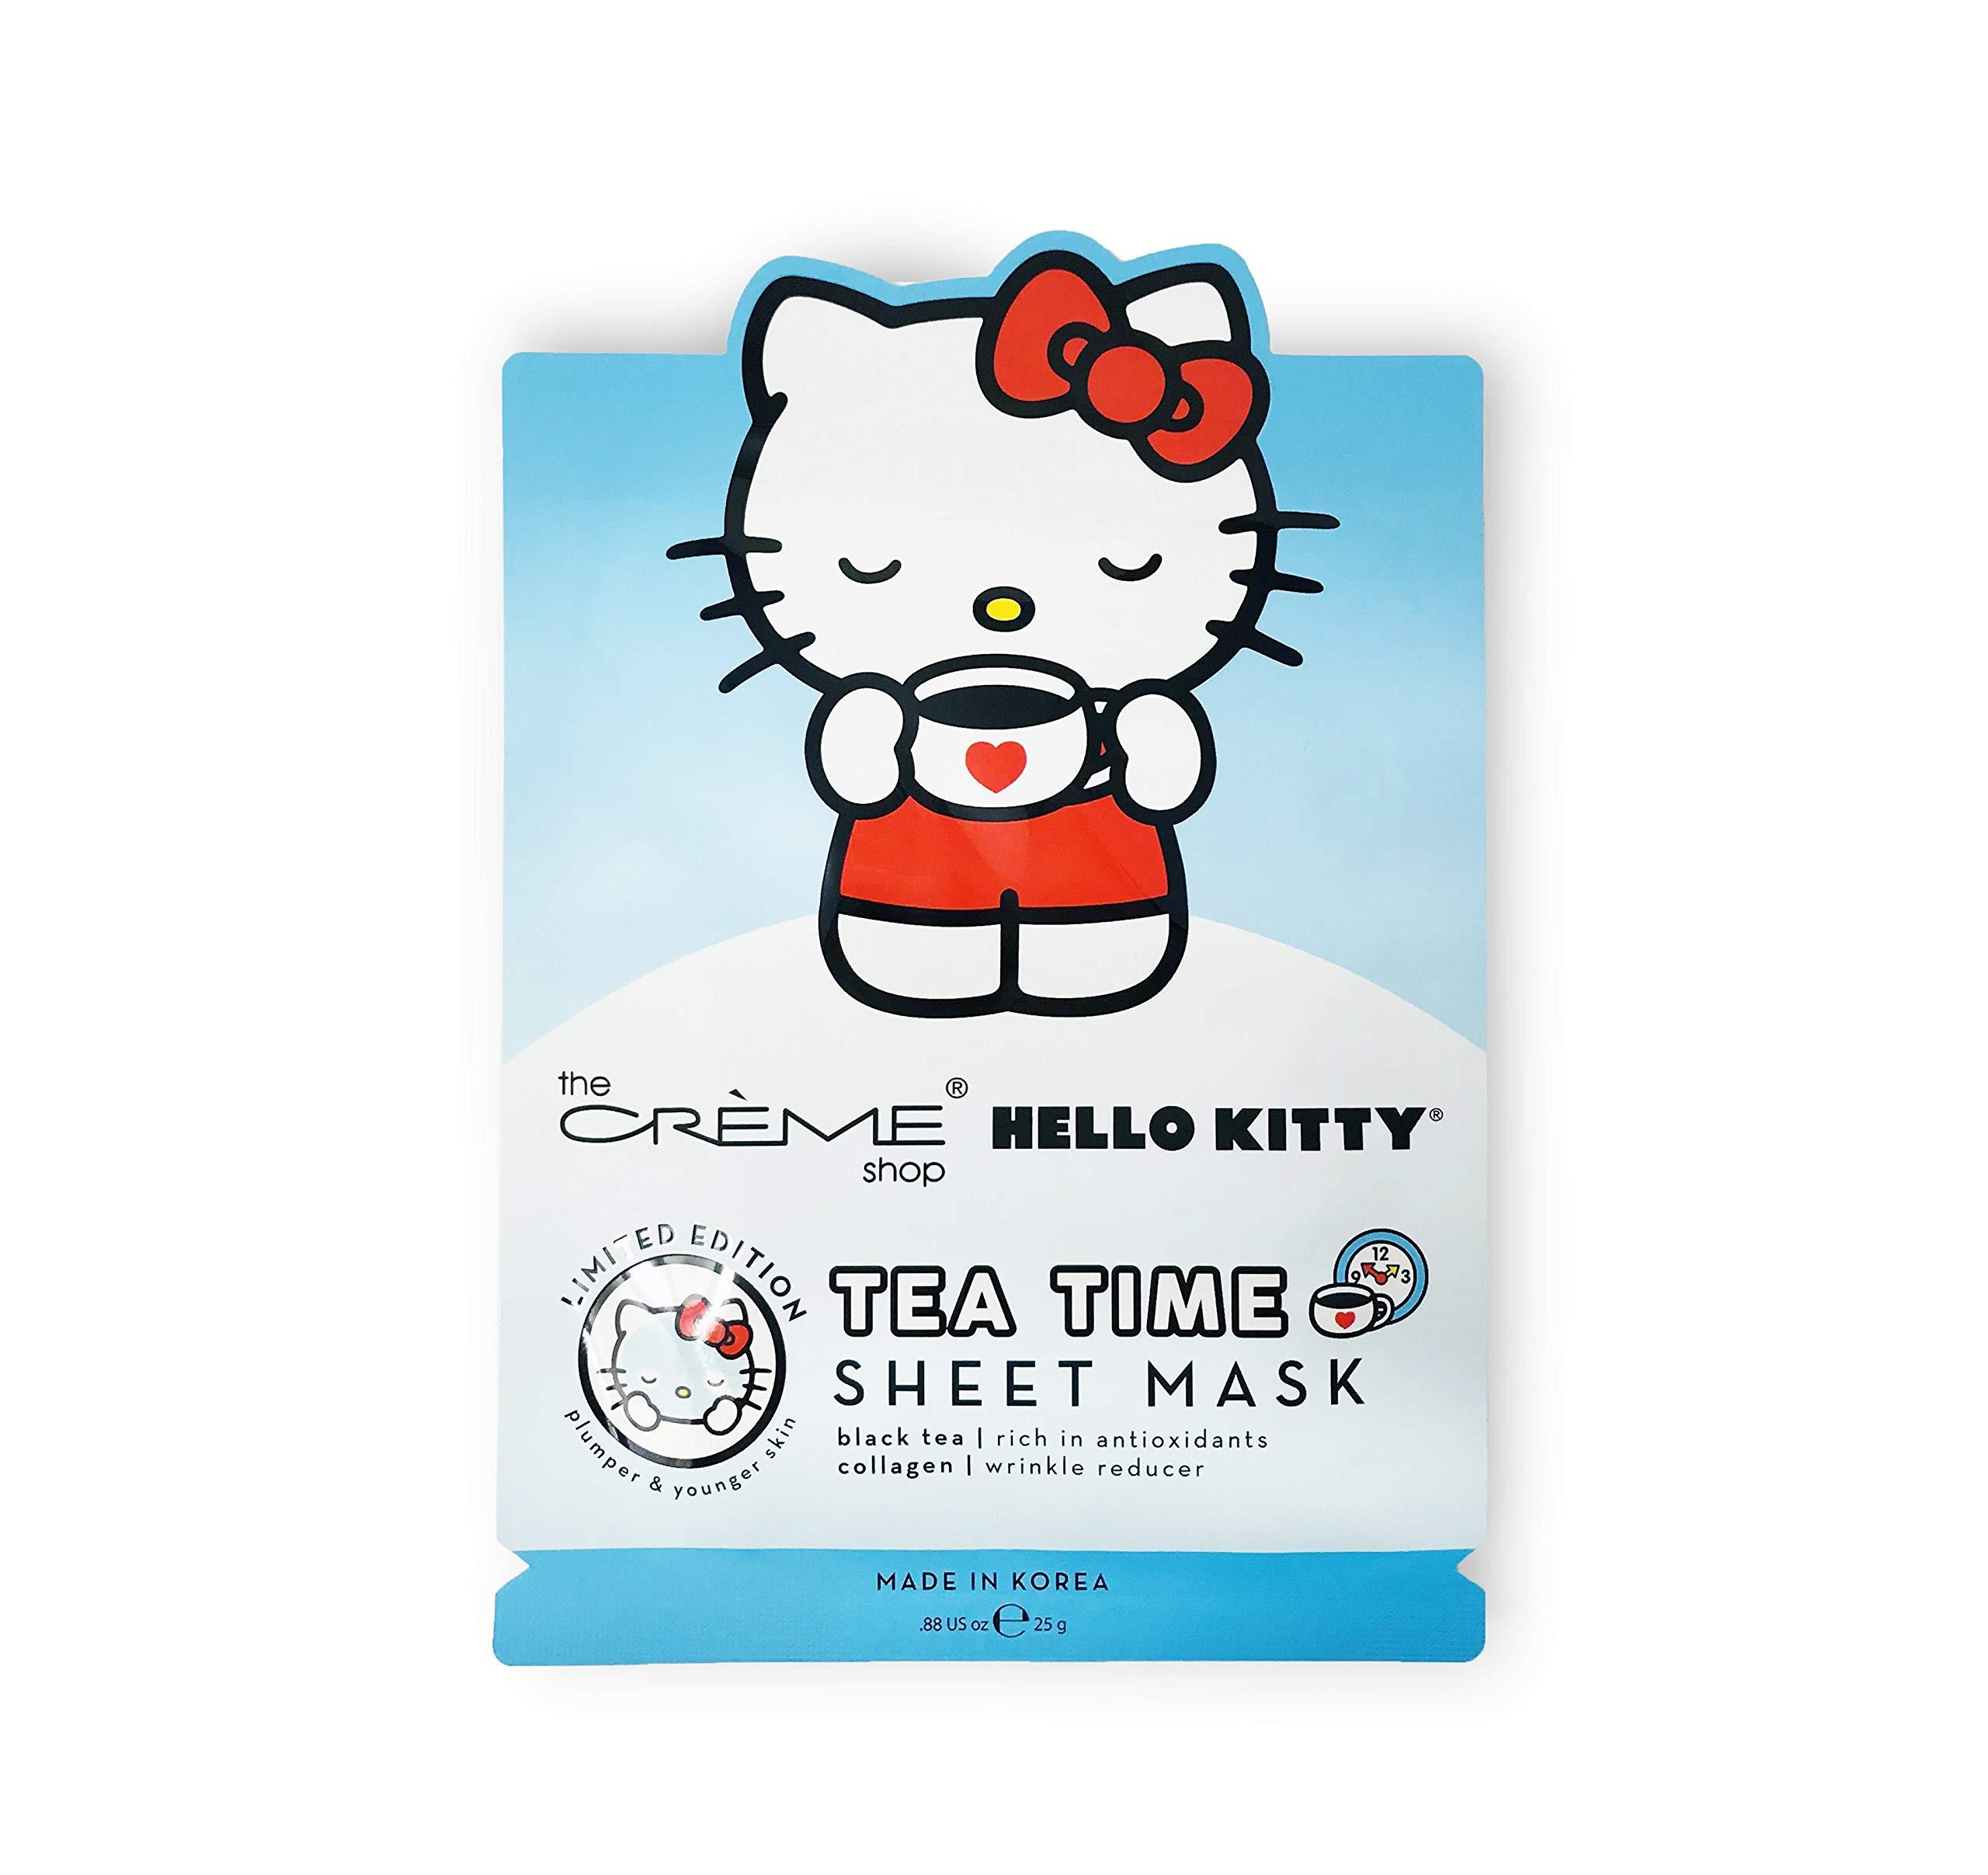 8e0af017b Amazon.com : The Crème Shop x Sanrio Sheet Mask (Hello Kitty Tea Time) :  Beauty